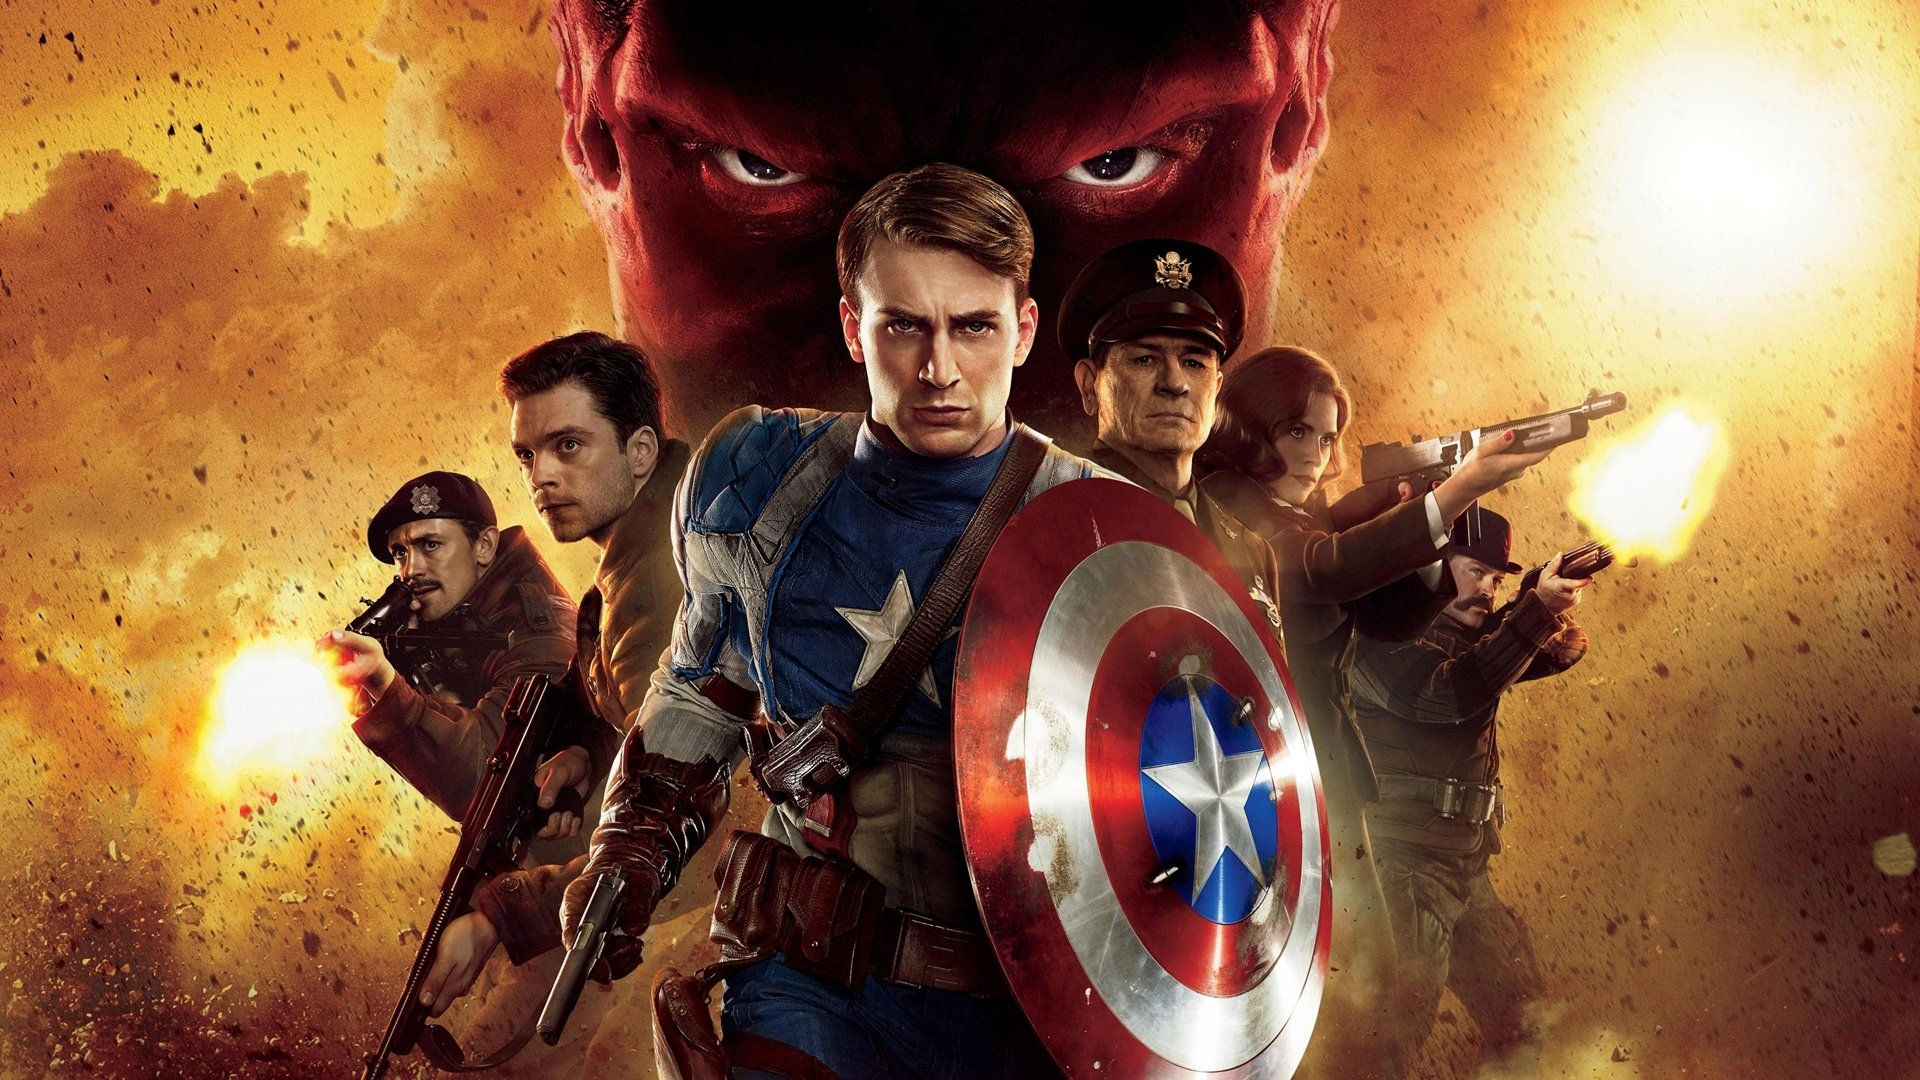 Captain America  C2 B7 Wallpapers Id148496